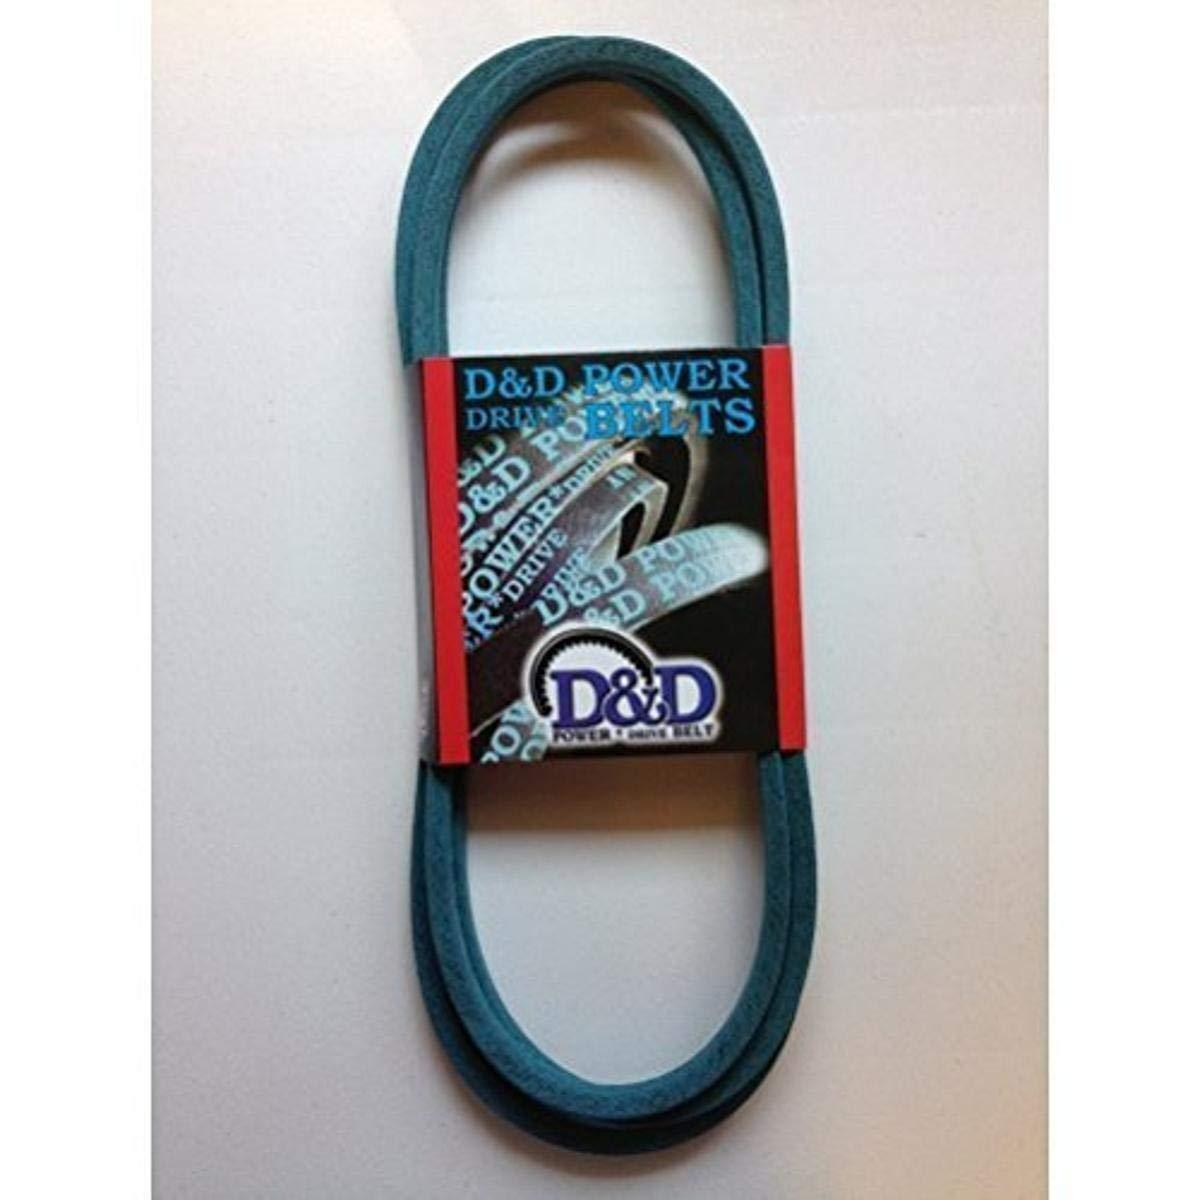 New item DD PowerDrive 759010 Bombing new work Toro or Kevlar Bel Horse Wheel Replacement